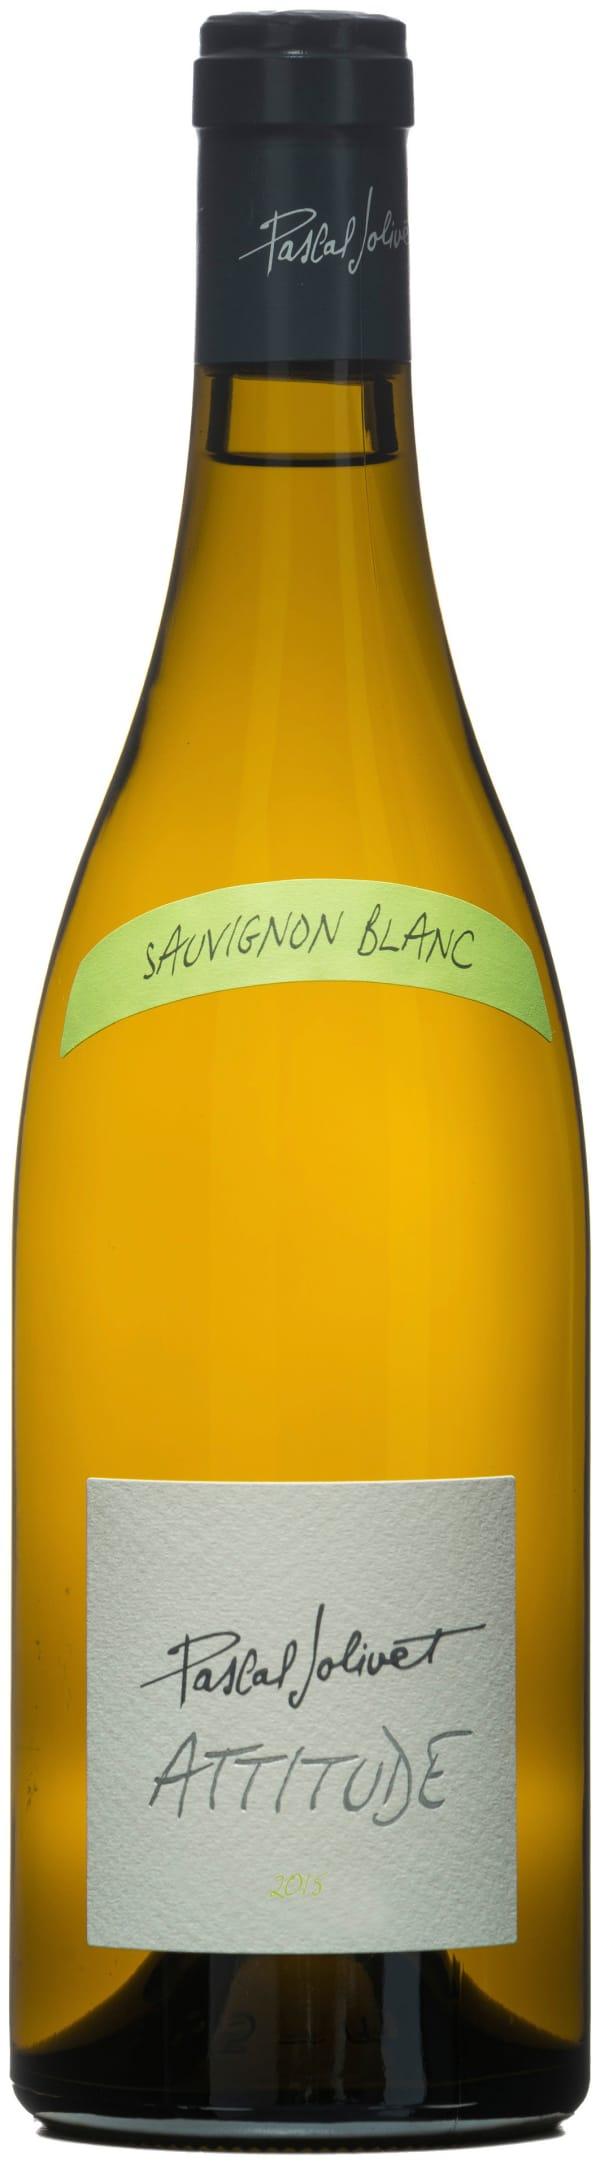 Pascal Jolivet Attitude Sauvignon Blanc 2017